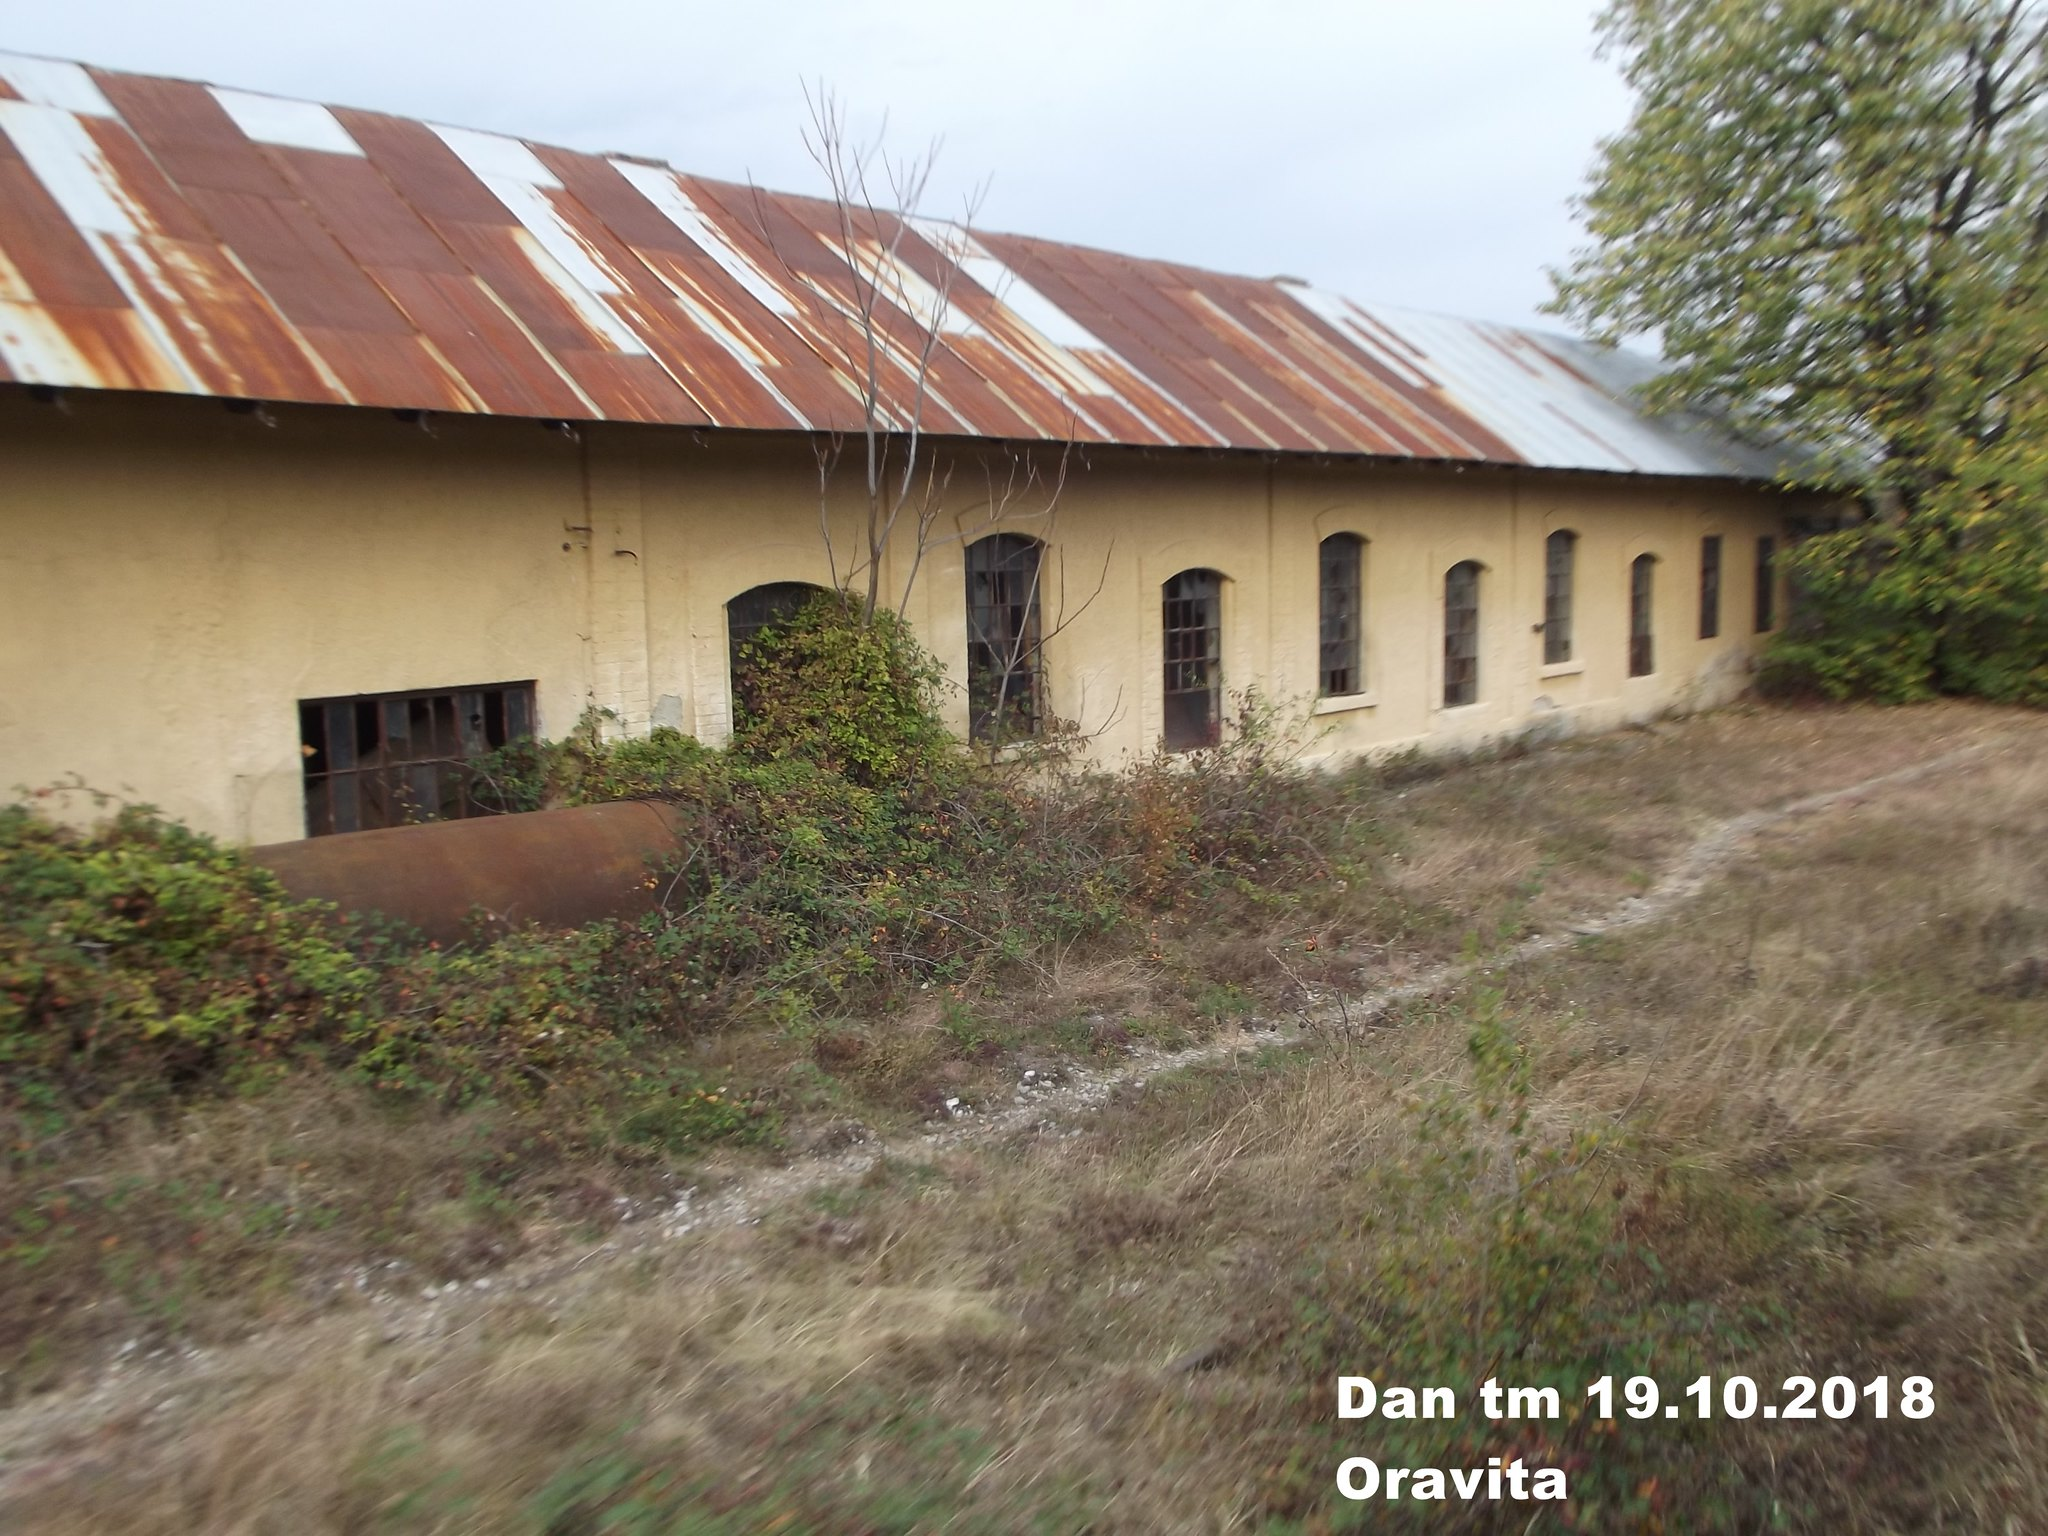 925 : Oravita - Anina - Pagina 40 44746235864_8467c1ea74_k